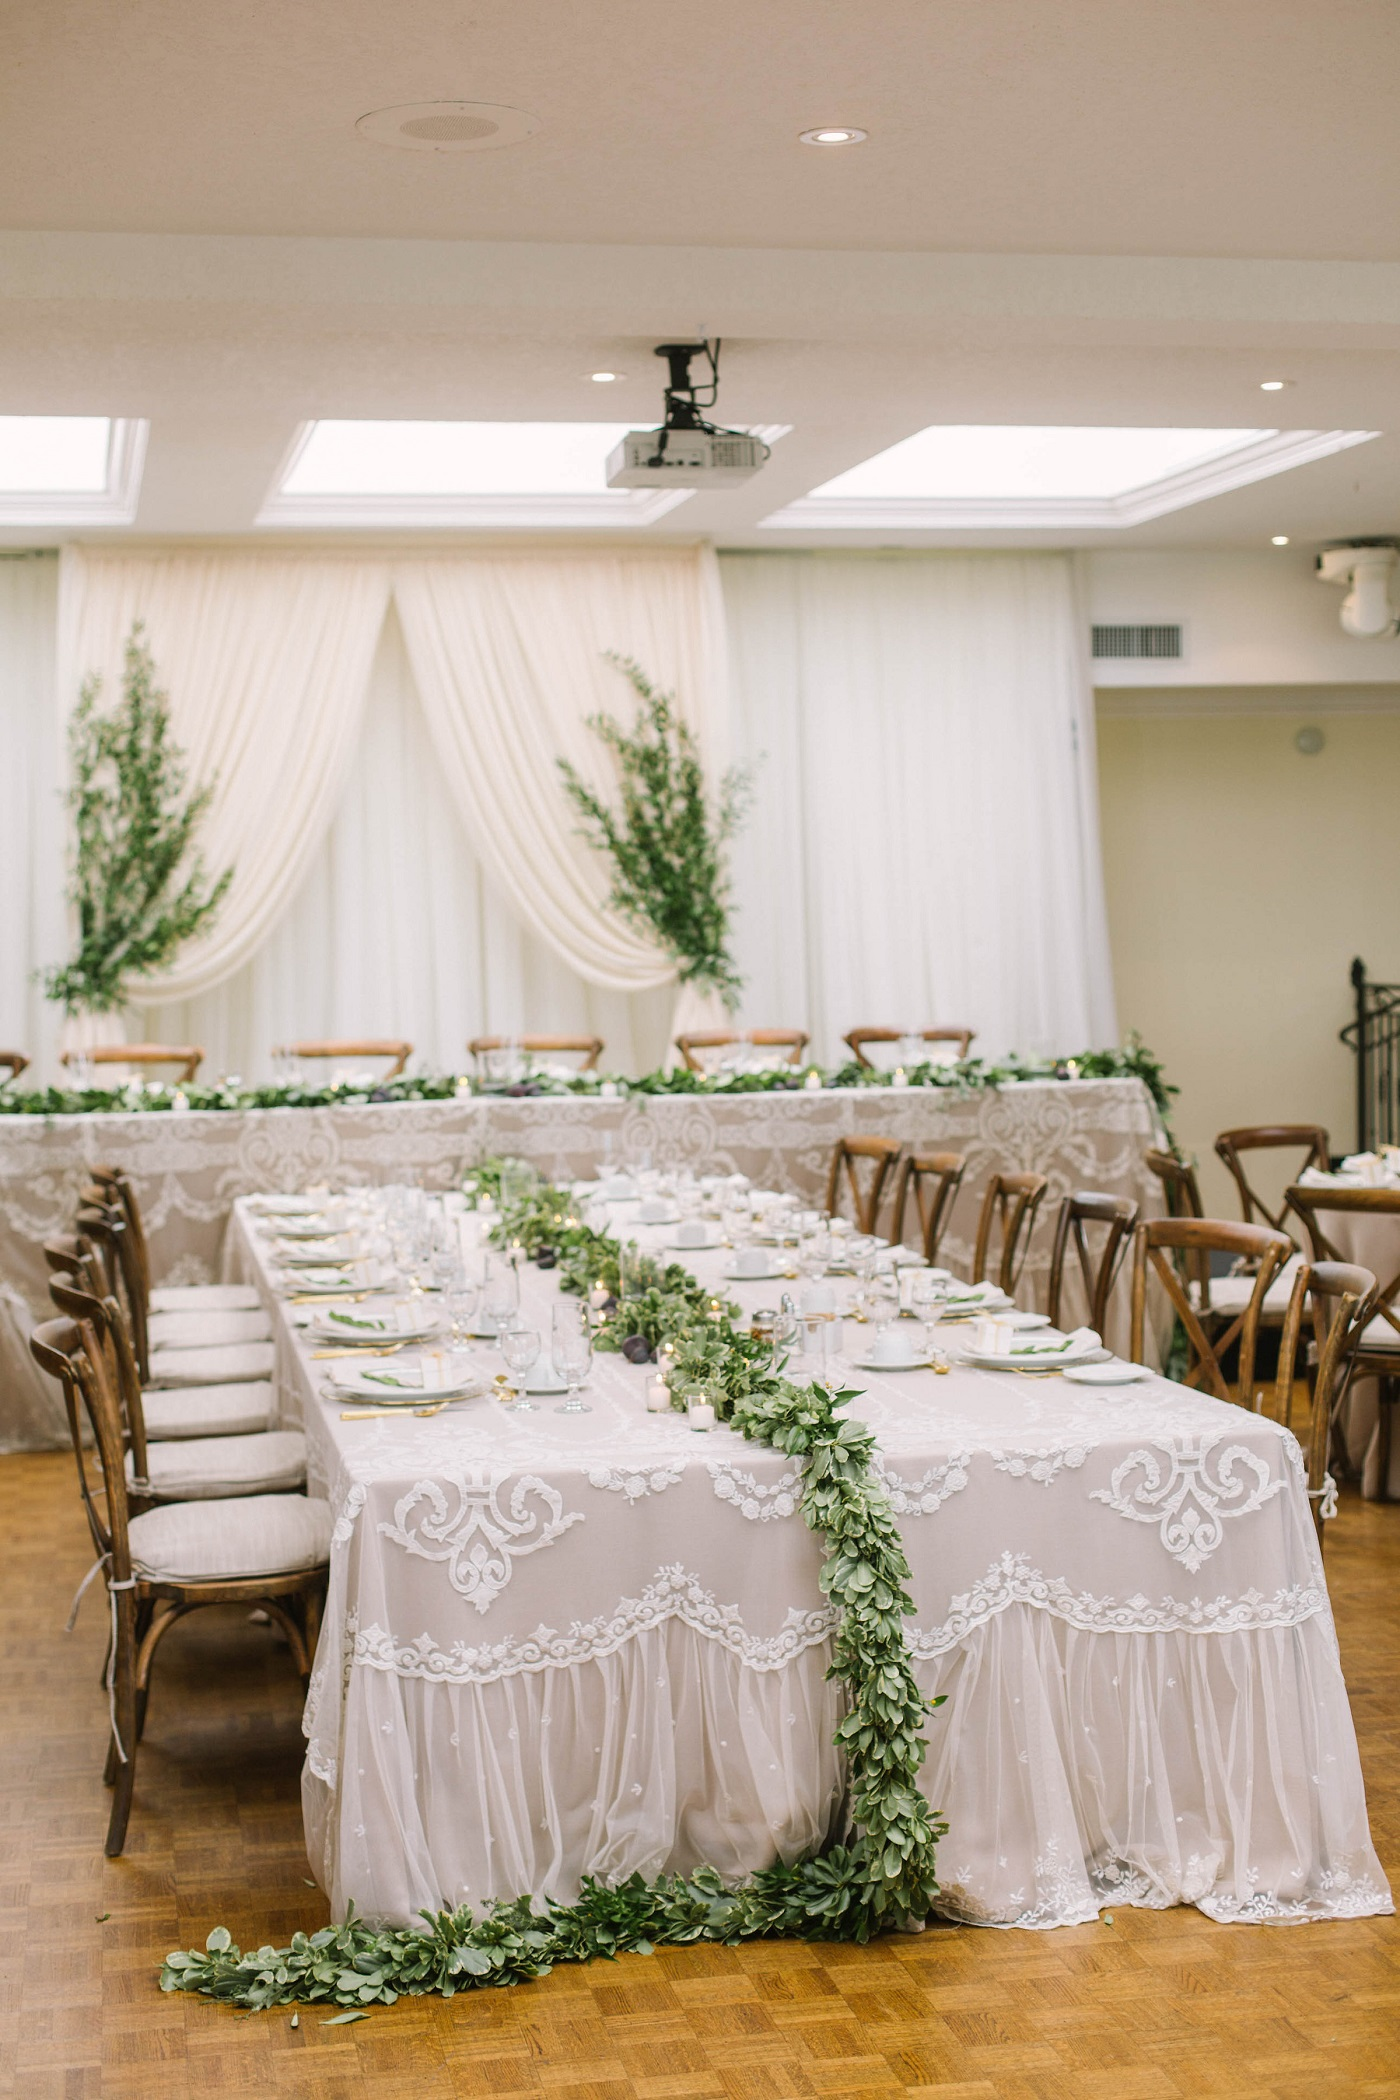 liuna-gardens-wedding-hamilton-kj-and-co-22.JPG